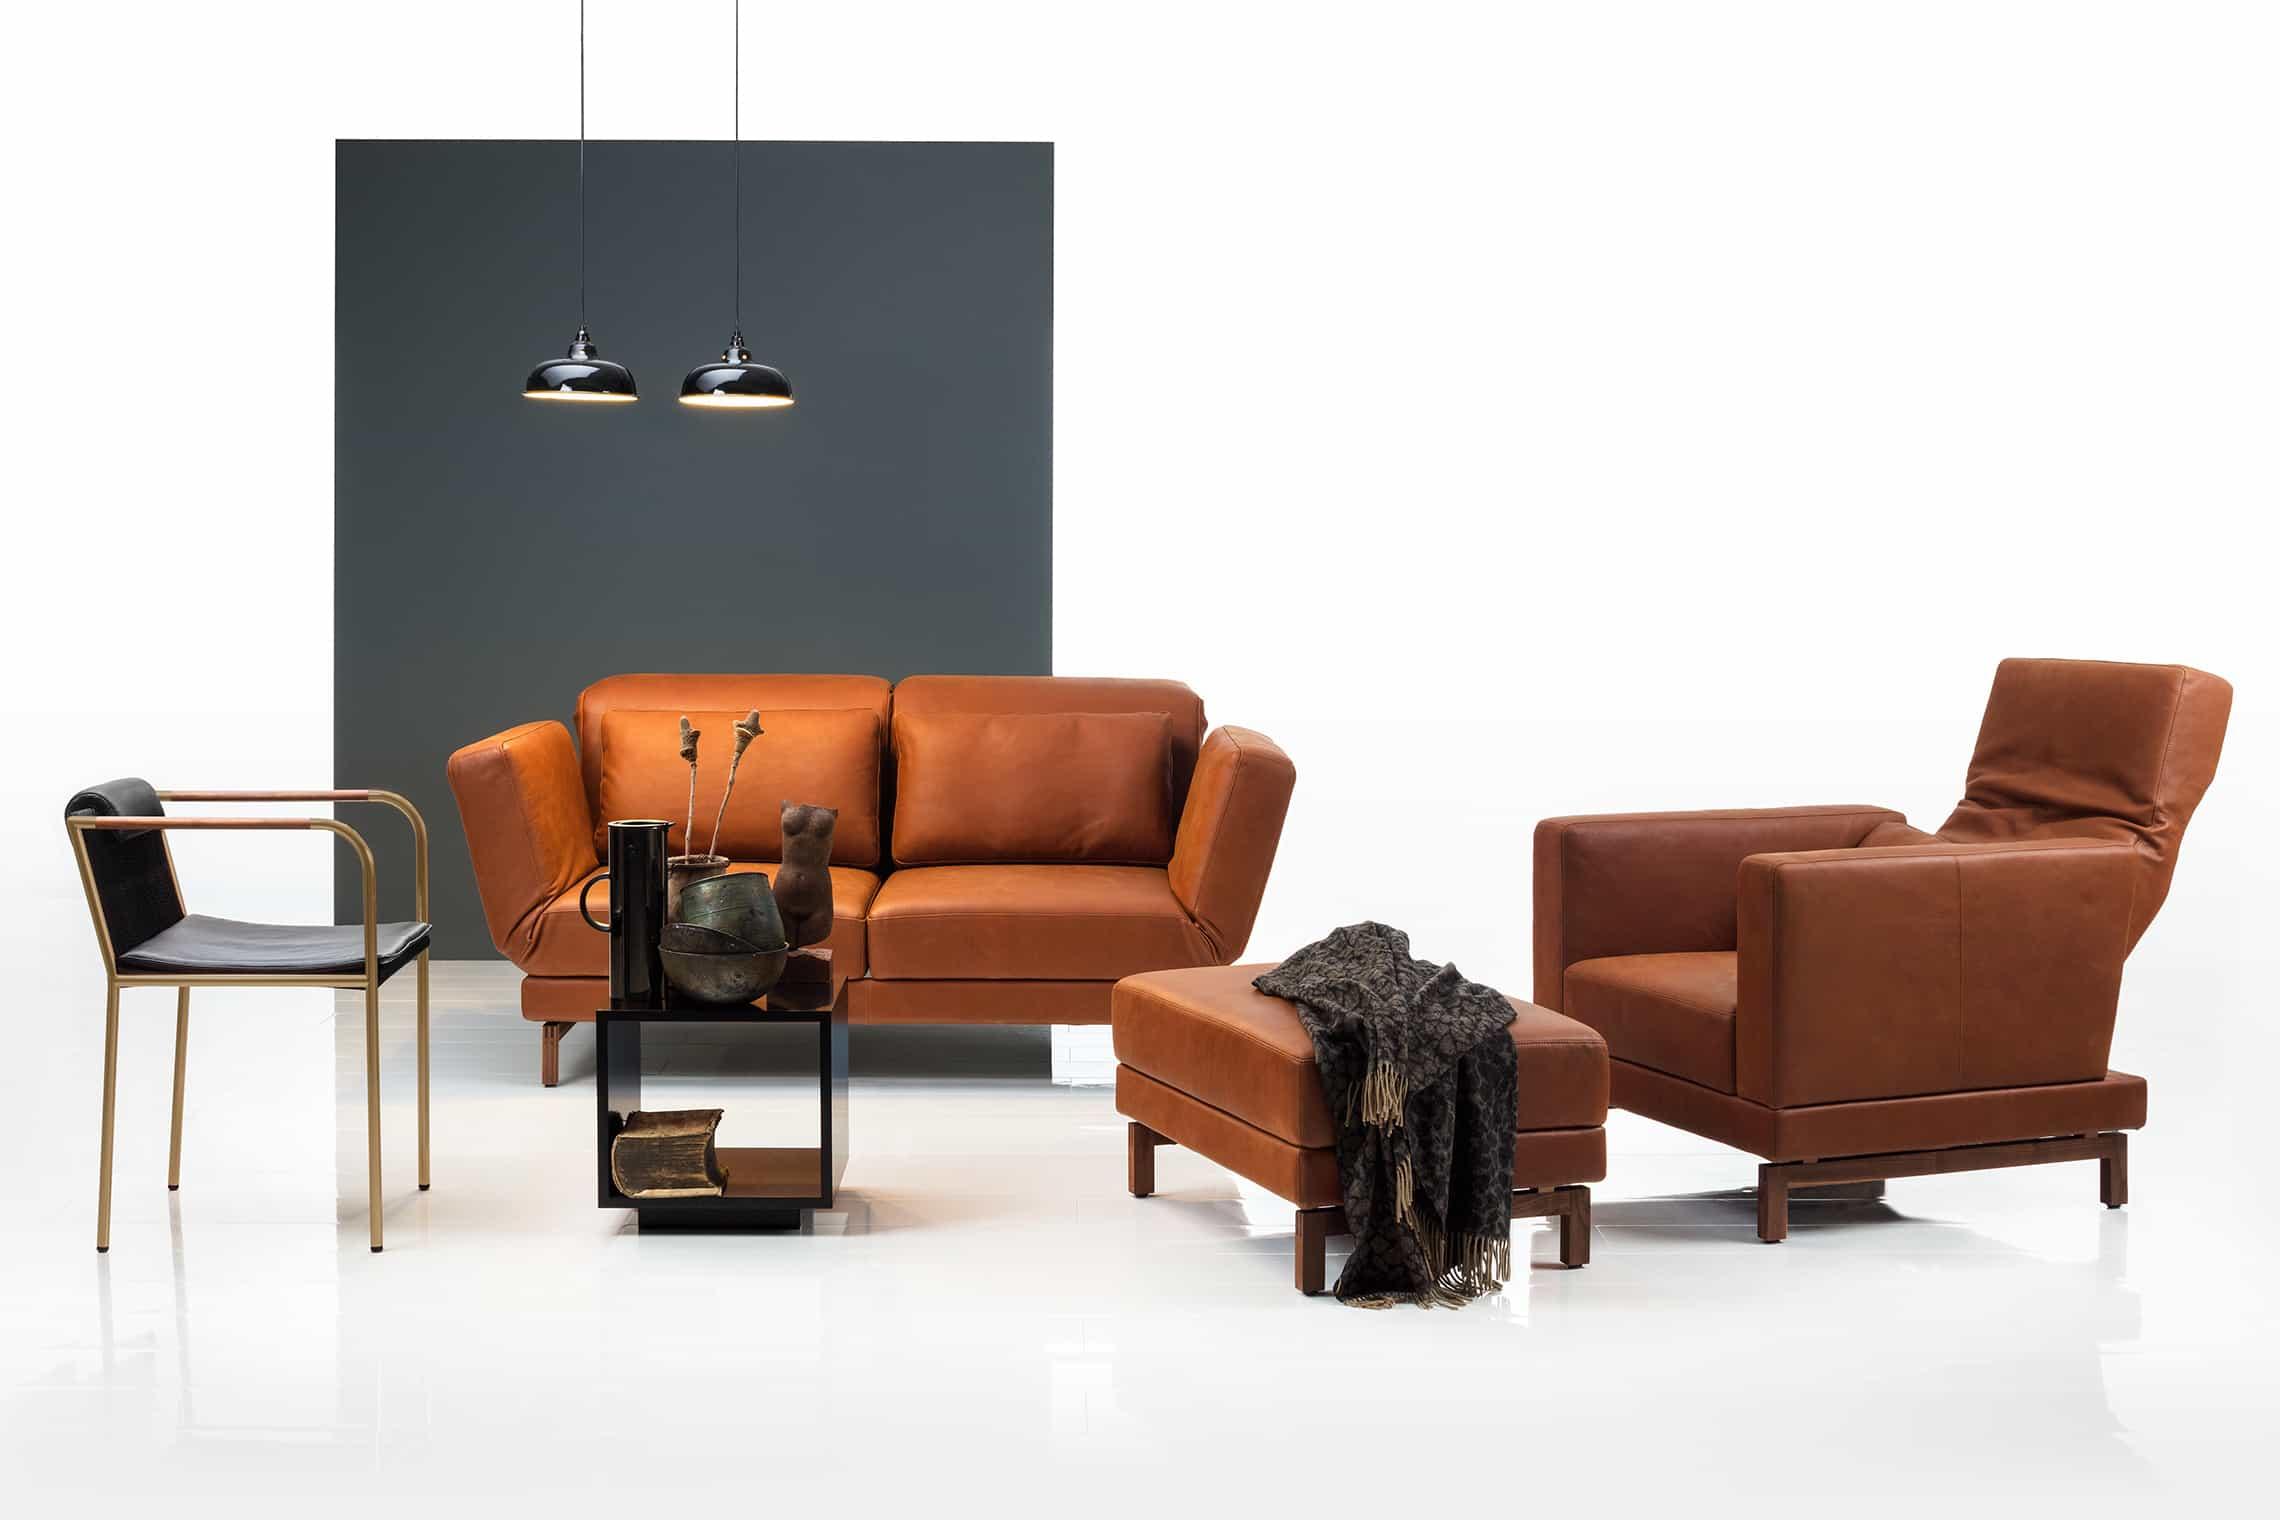 sofa daybed moule wohnwiese jette schlund ellingen. Black Bedroom Furniture Sets. Home Design Ideas